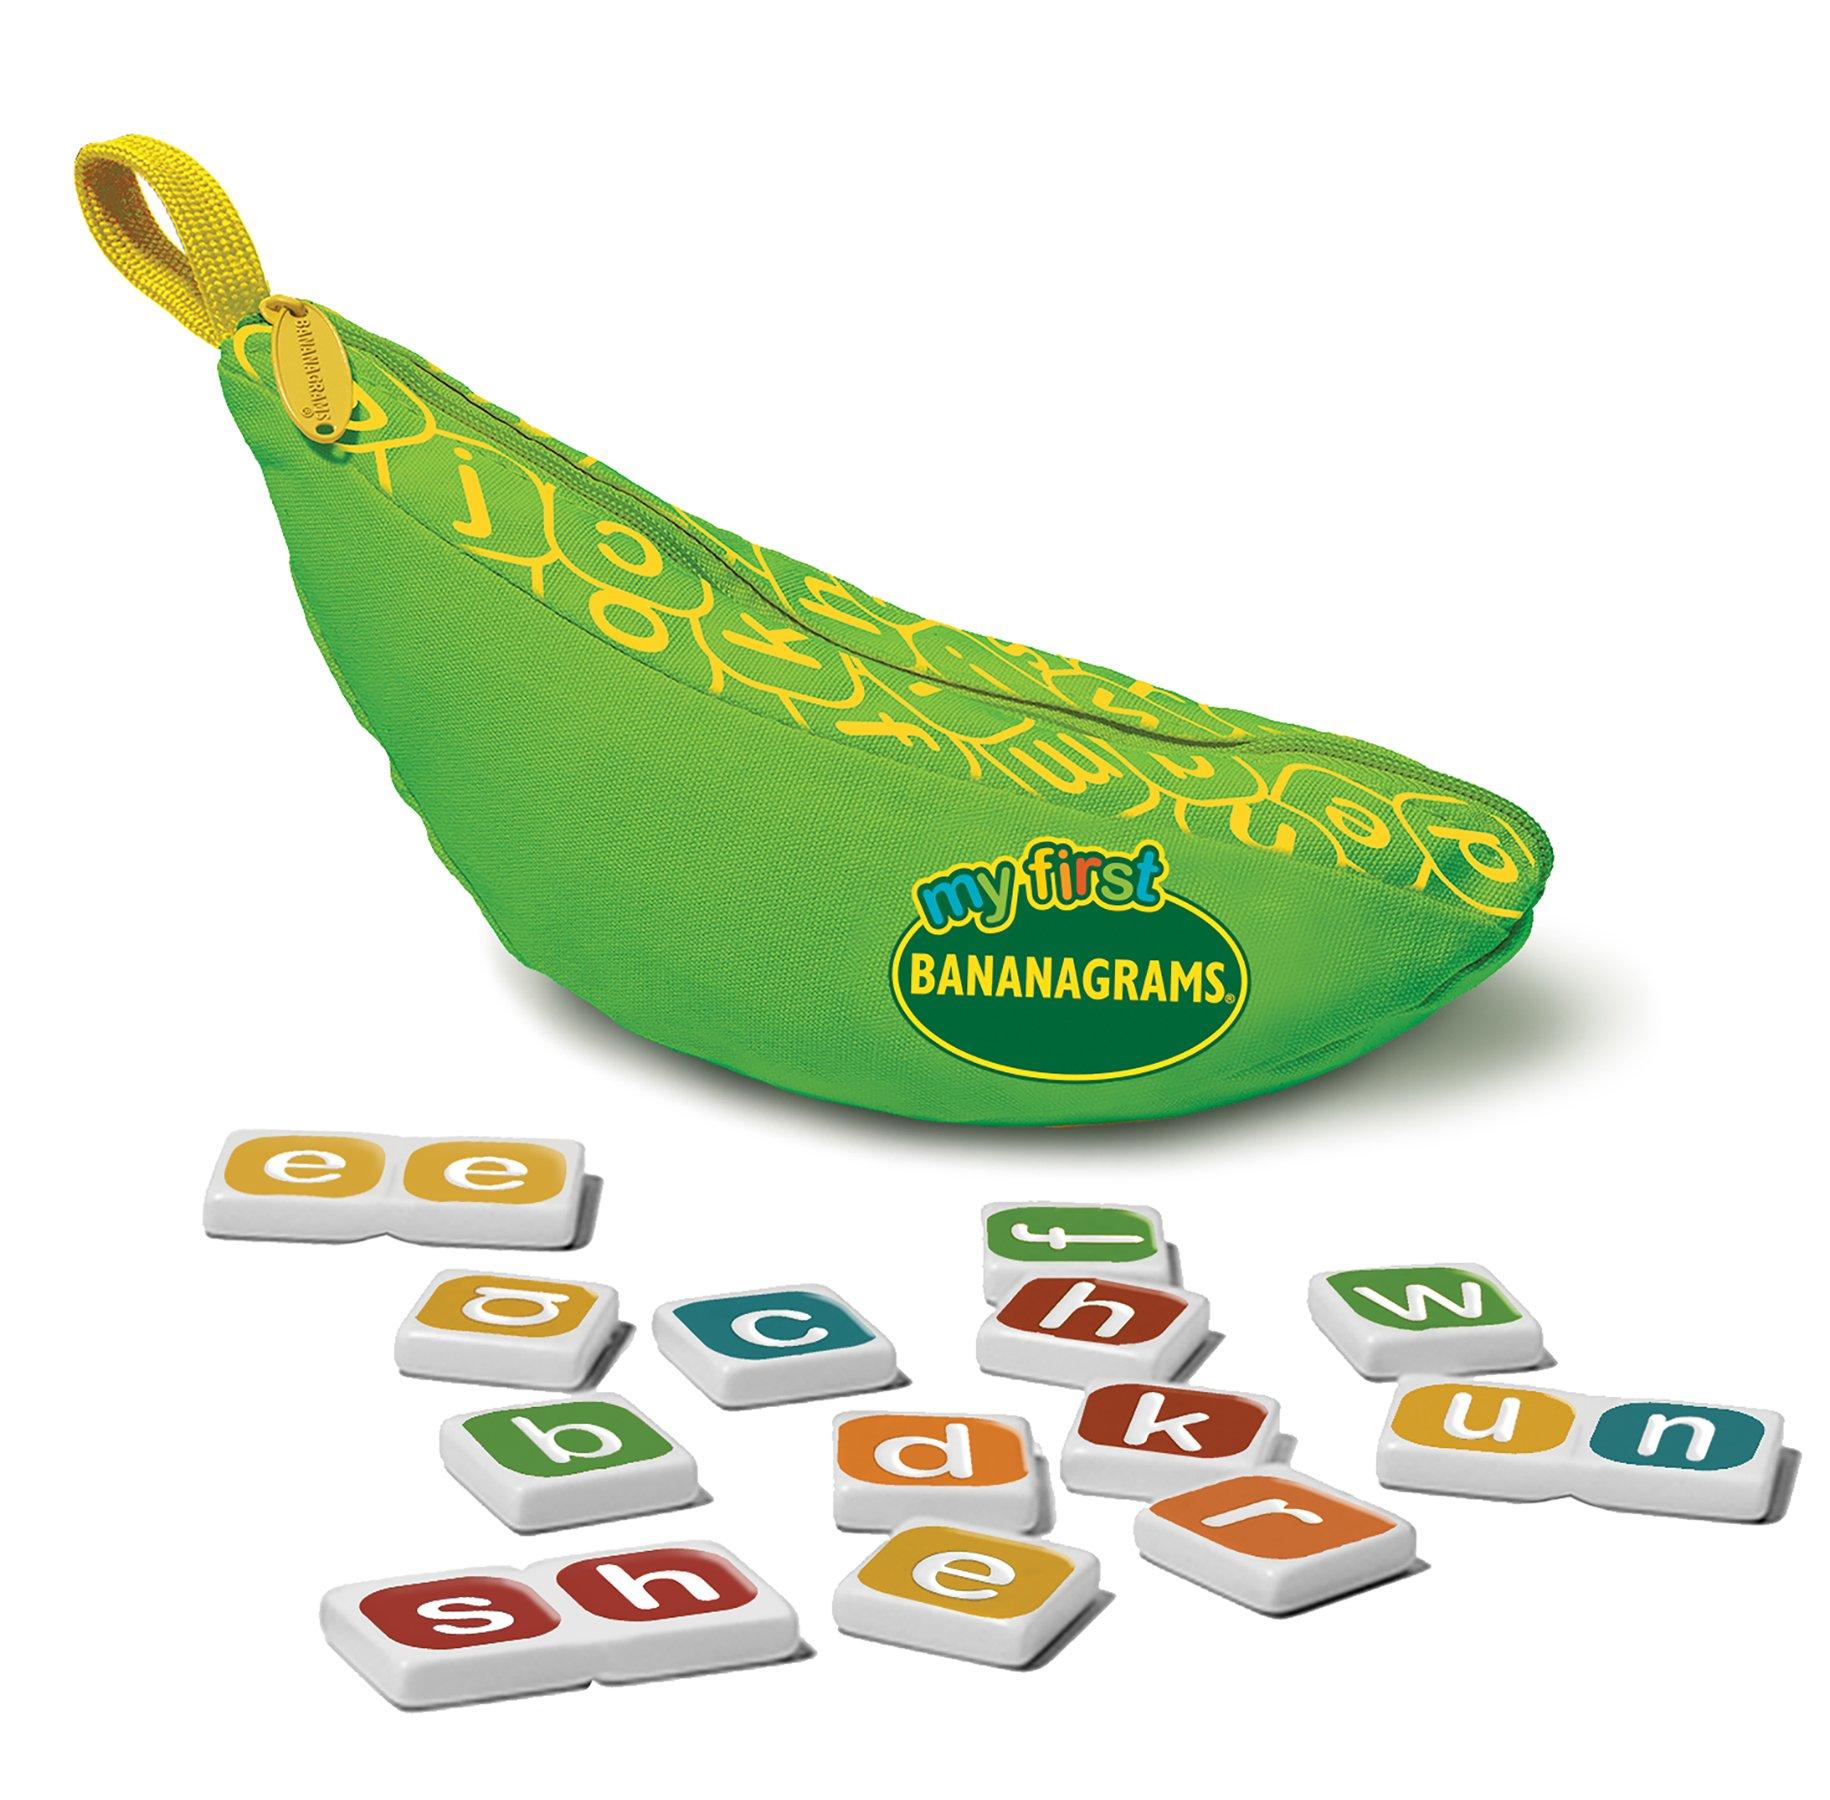 Bananagrams My First Multi-Award Winning Kids Spelling Game by Bananagrams